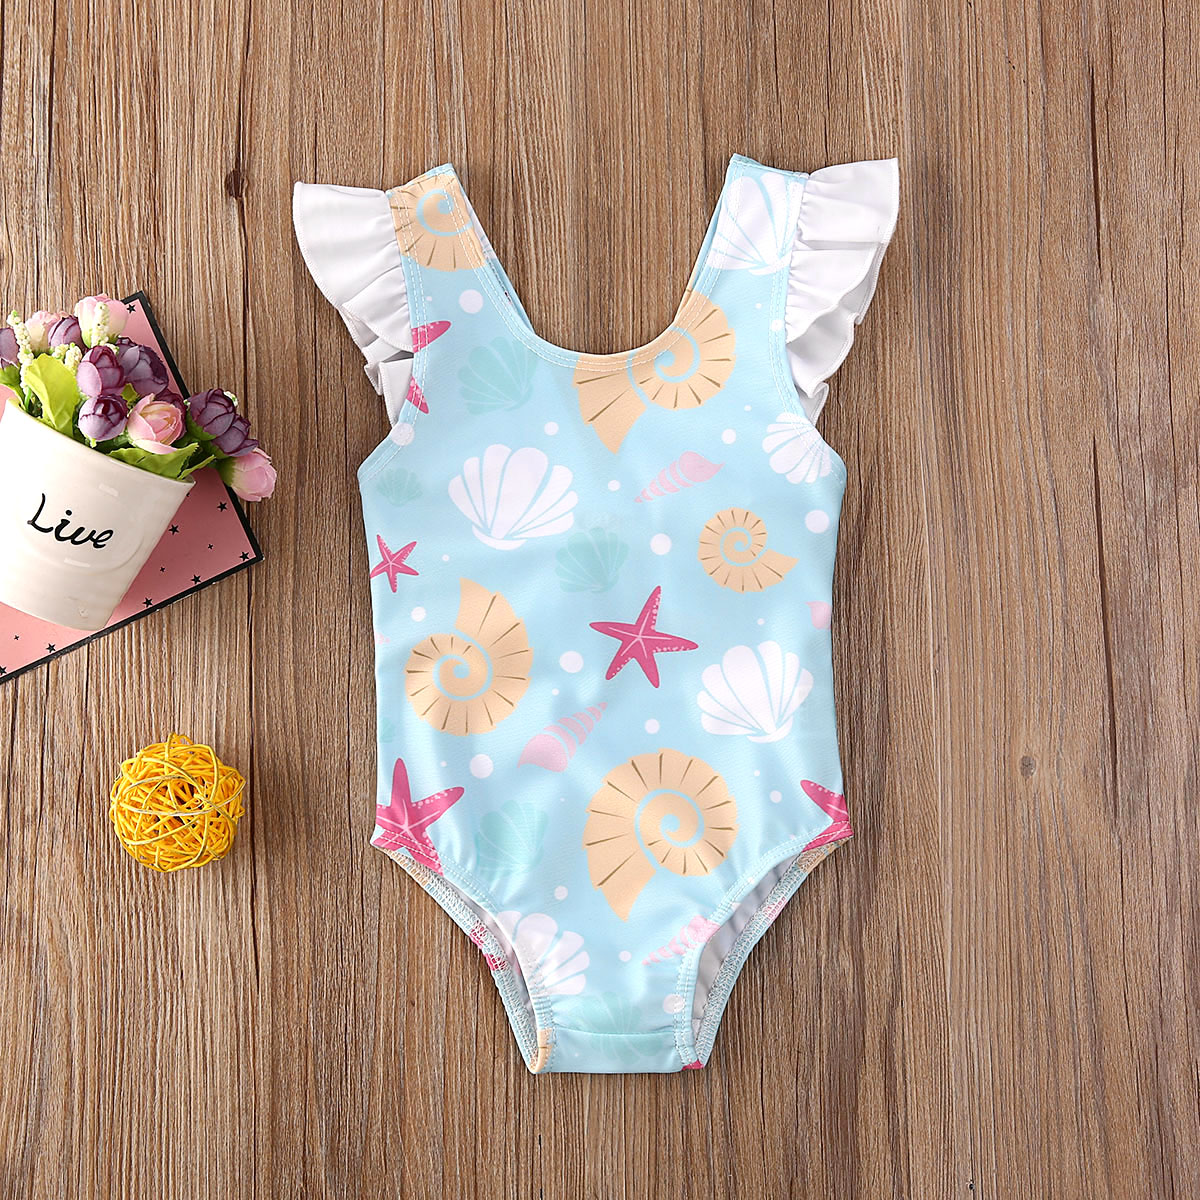 Pudcoco Newborn Baby Girl Clothes Beach Shell Print Sleeveless Bowknot Bikini Swimwear Swimsuit Swimming Bathing Suit Clothes